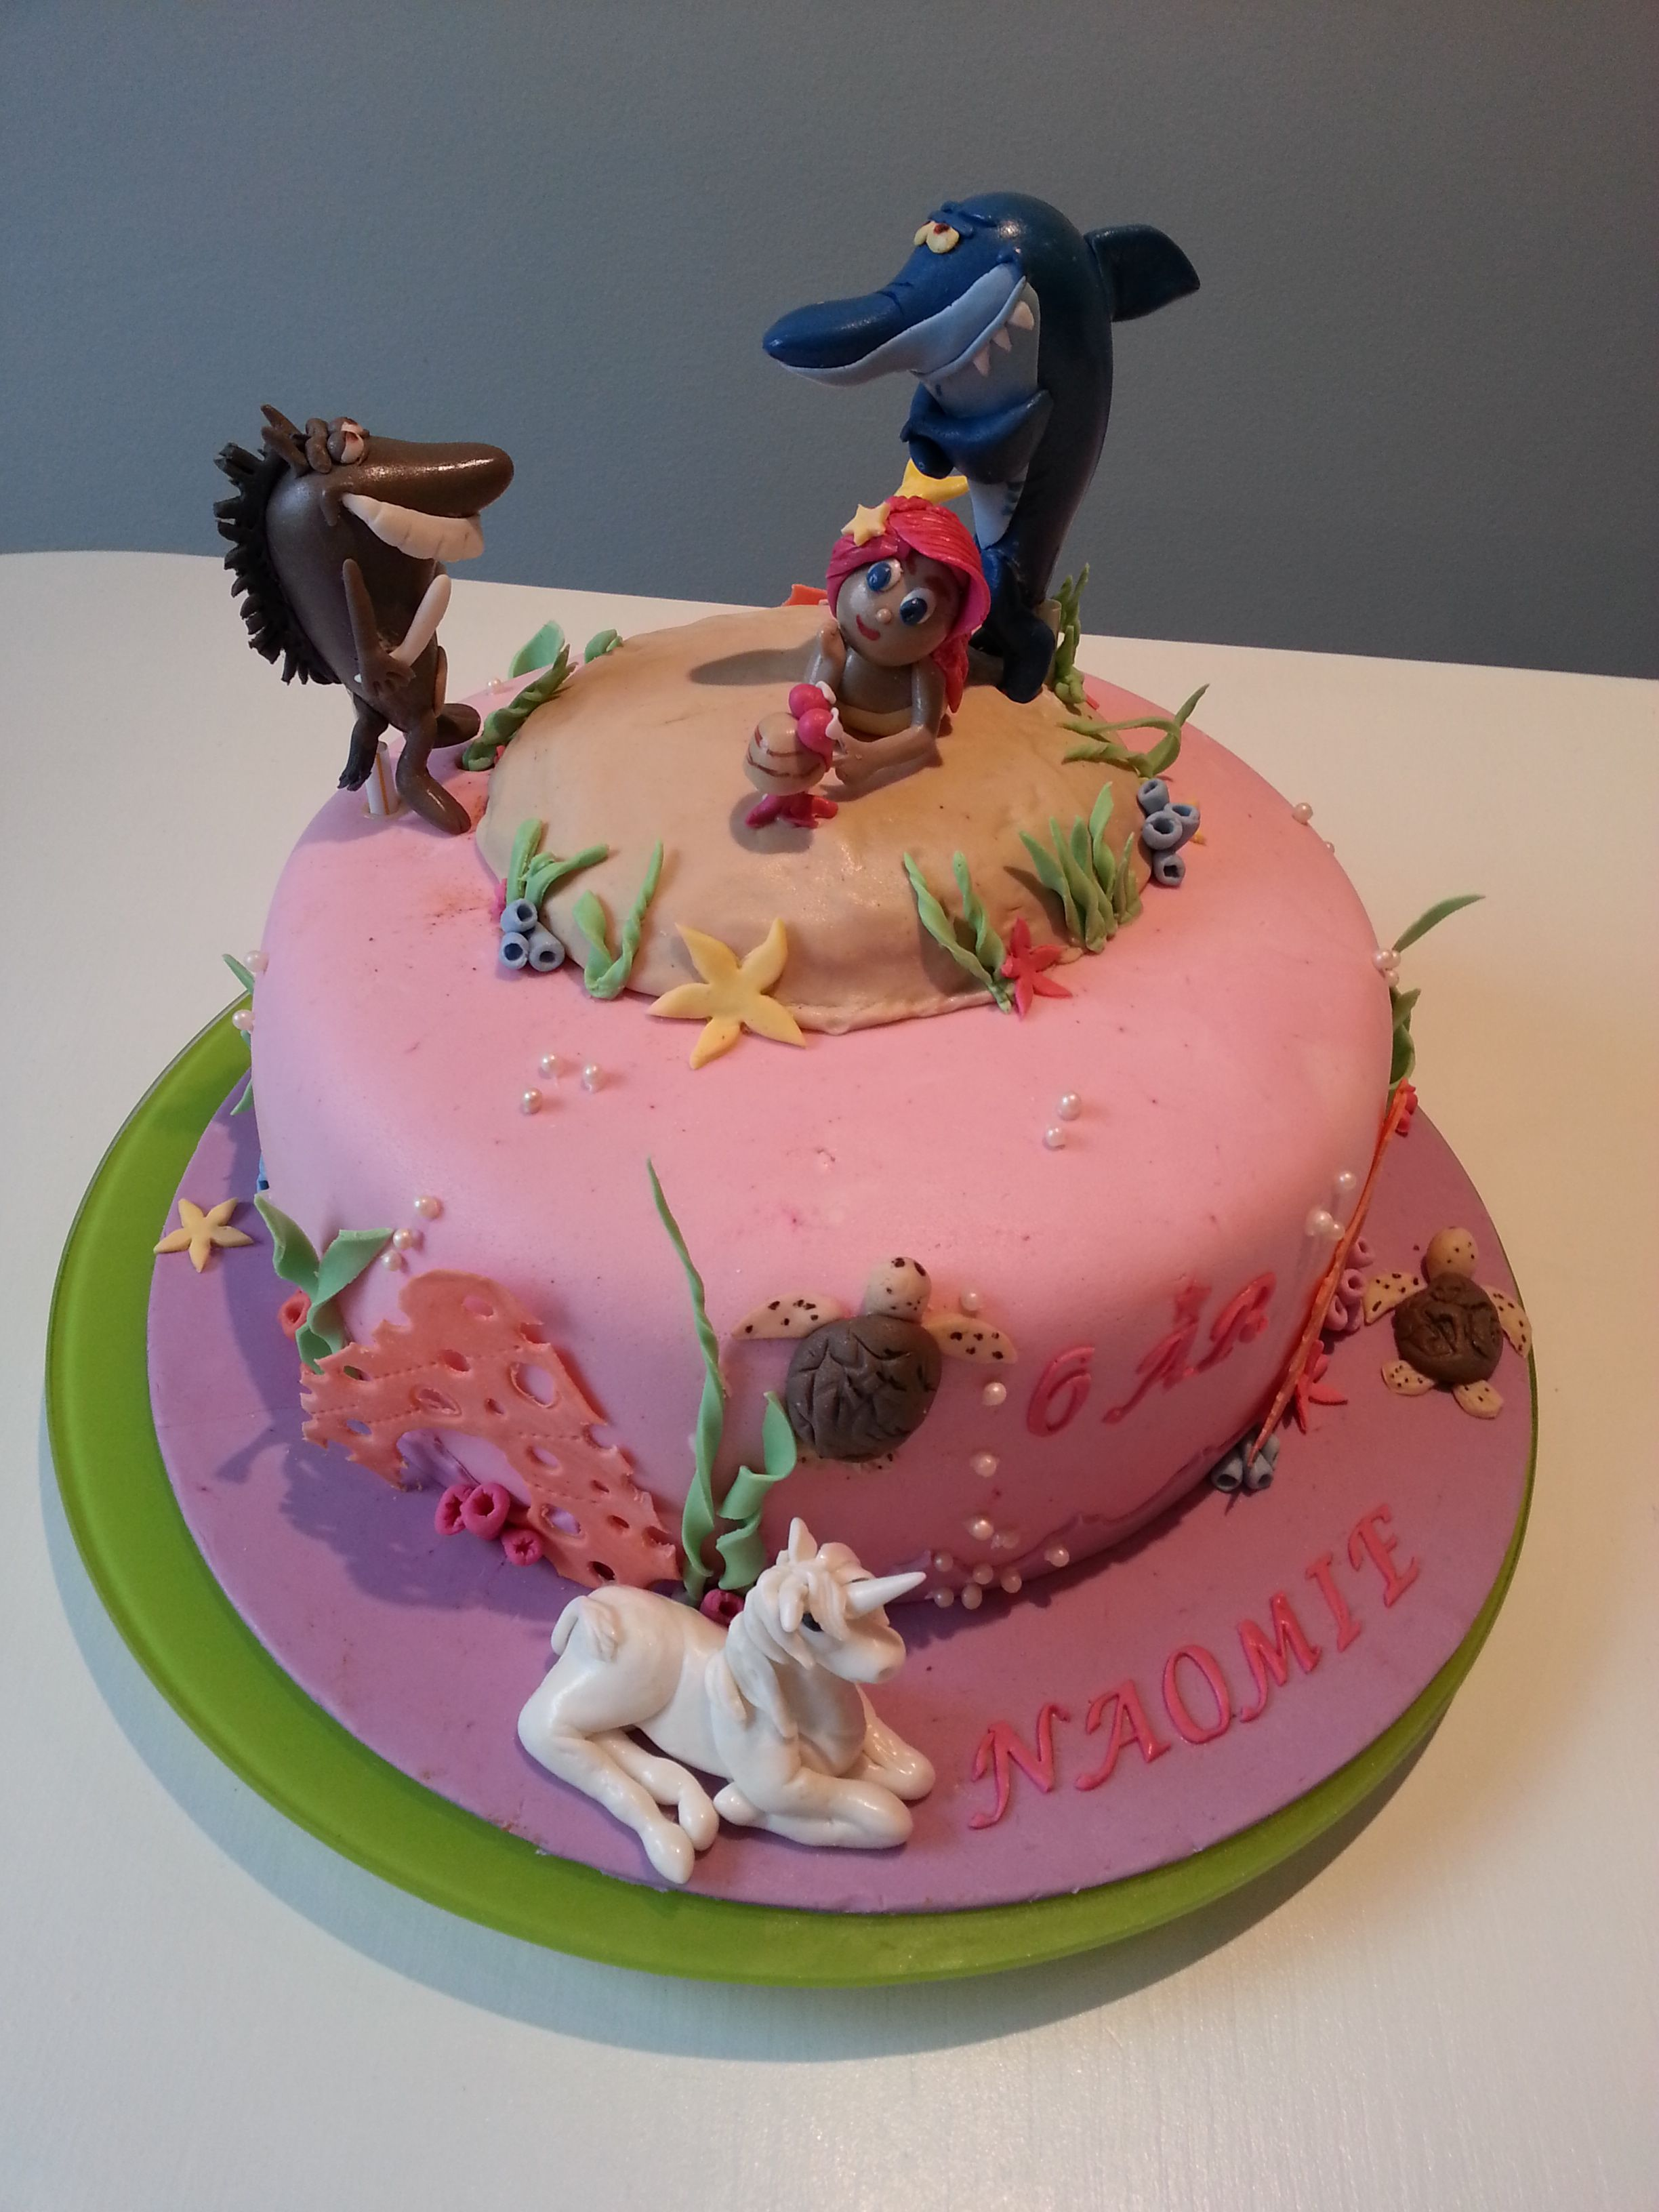 Zig and sharko cake dede things pinterest for Disegni zig e sharko